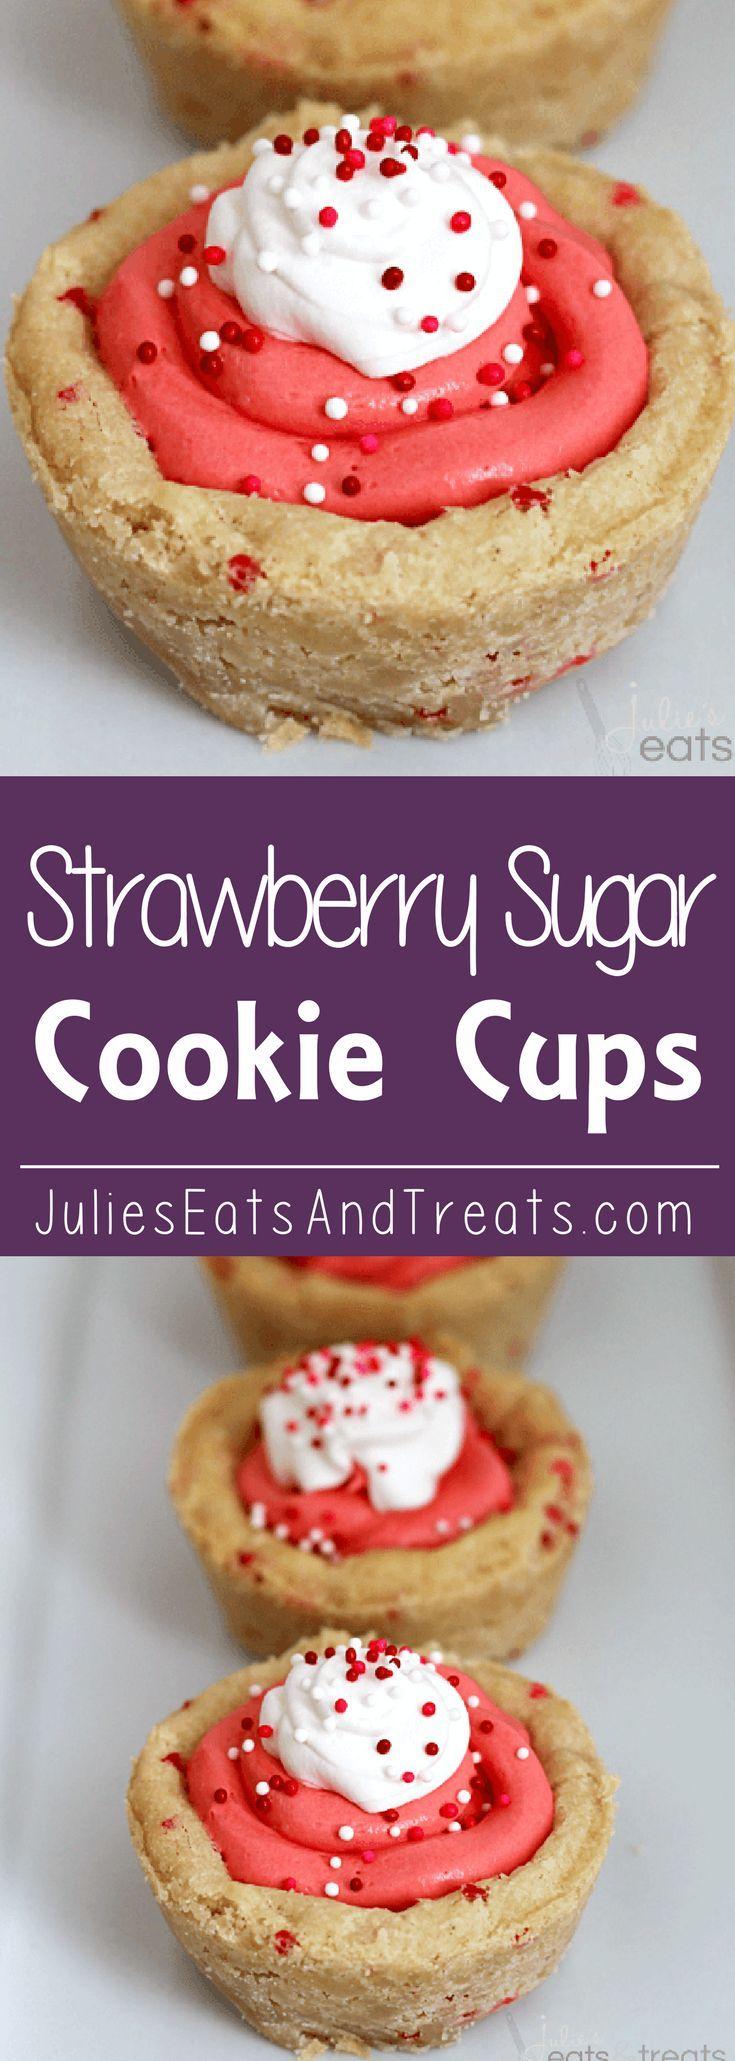 Strawberry Sugar Cookie Cups ~ Soft Pillsbury Sugar Cookie Dough filled with Strawberry Marshmallow Creme!